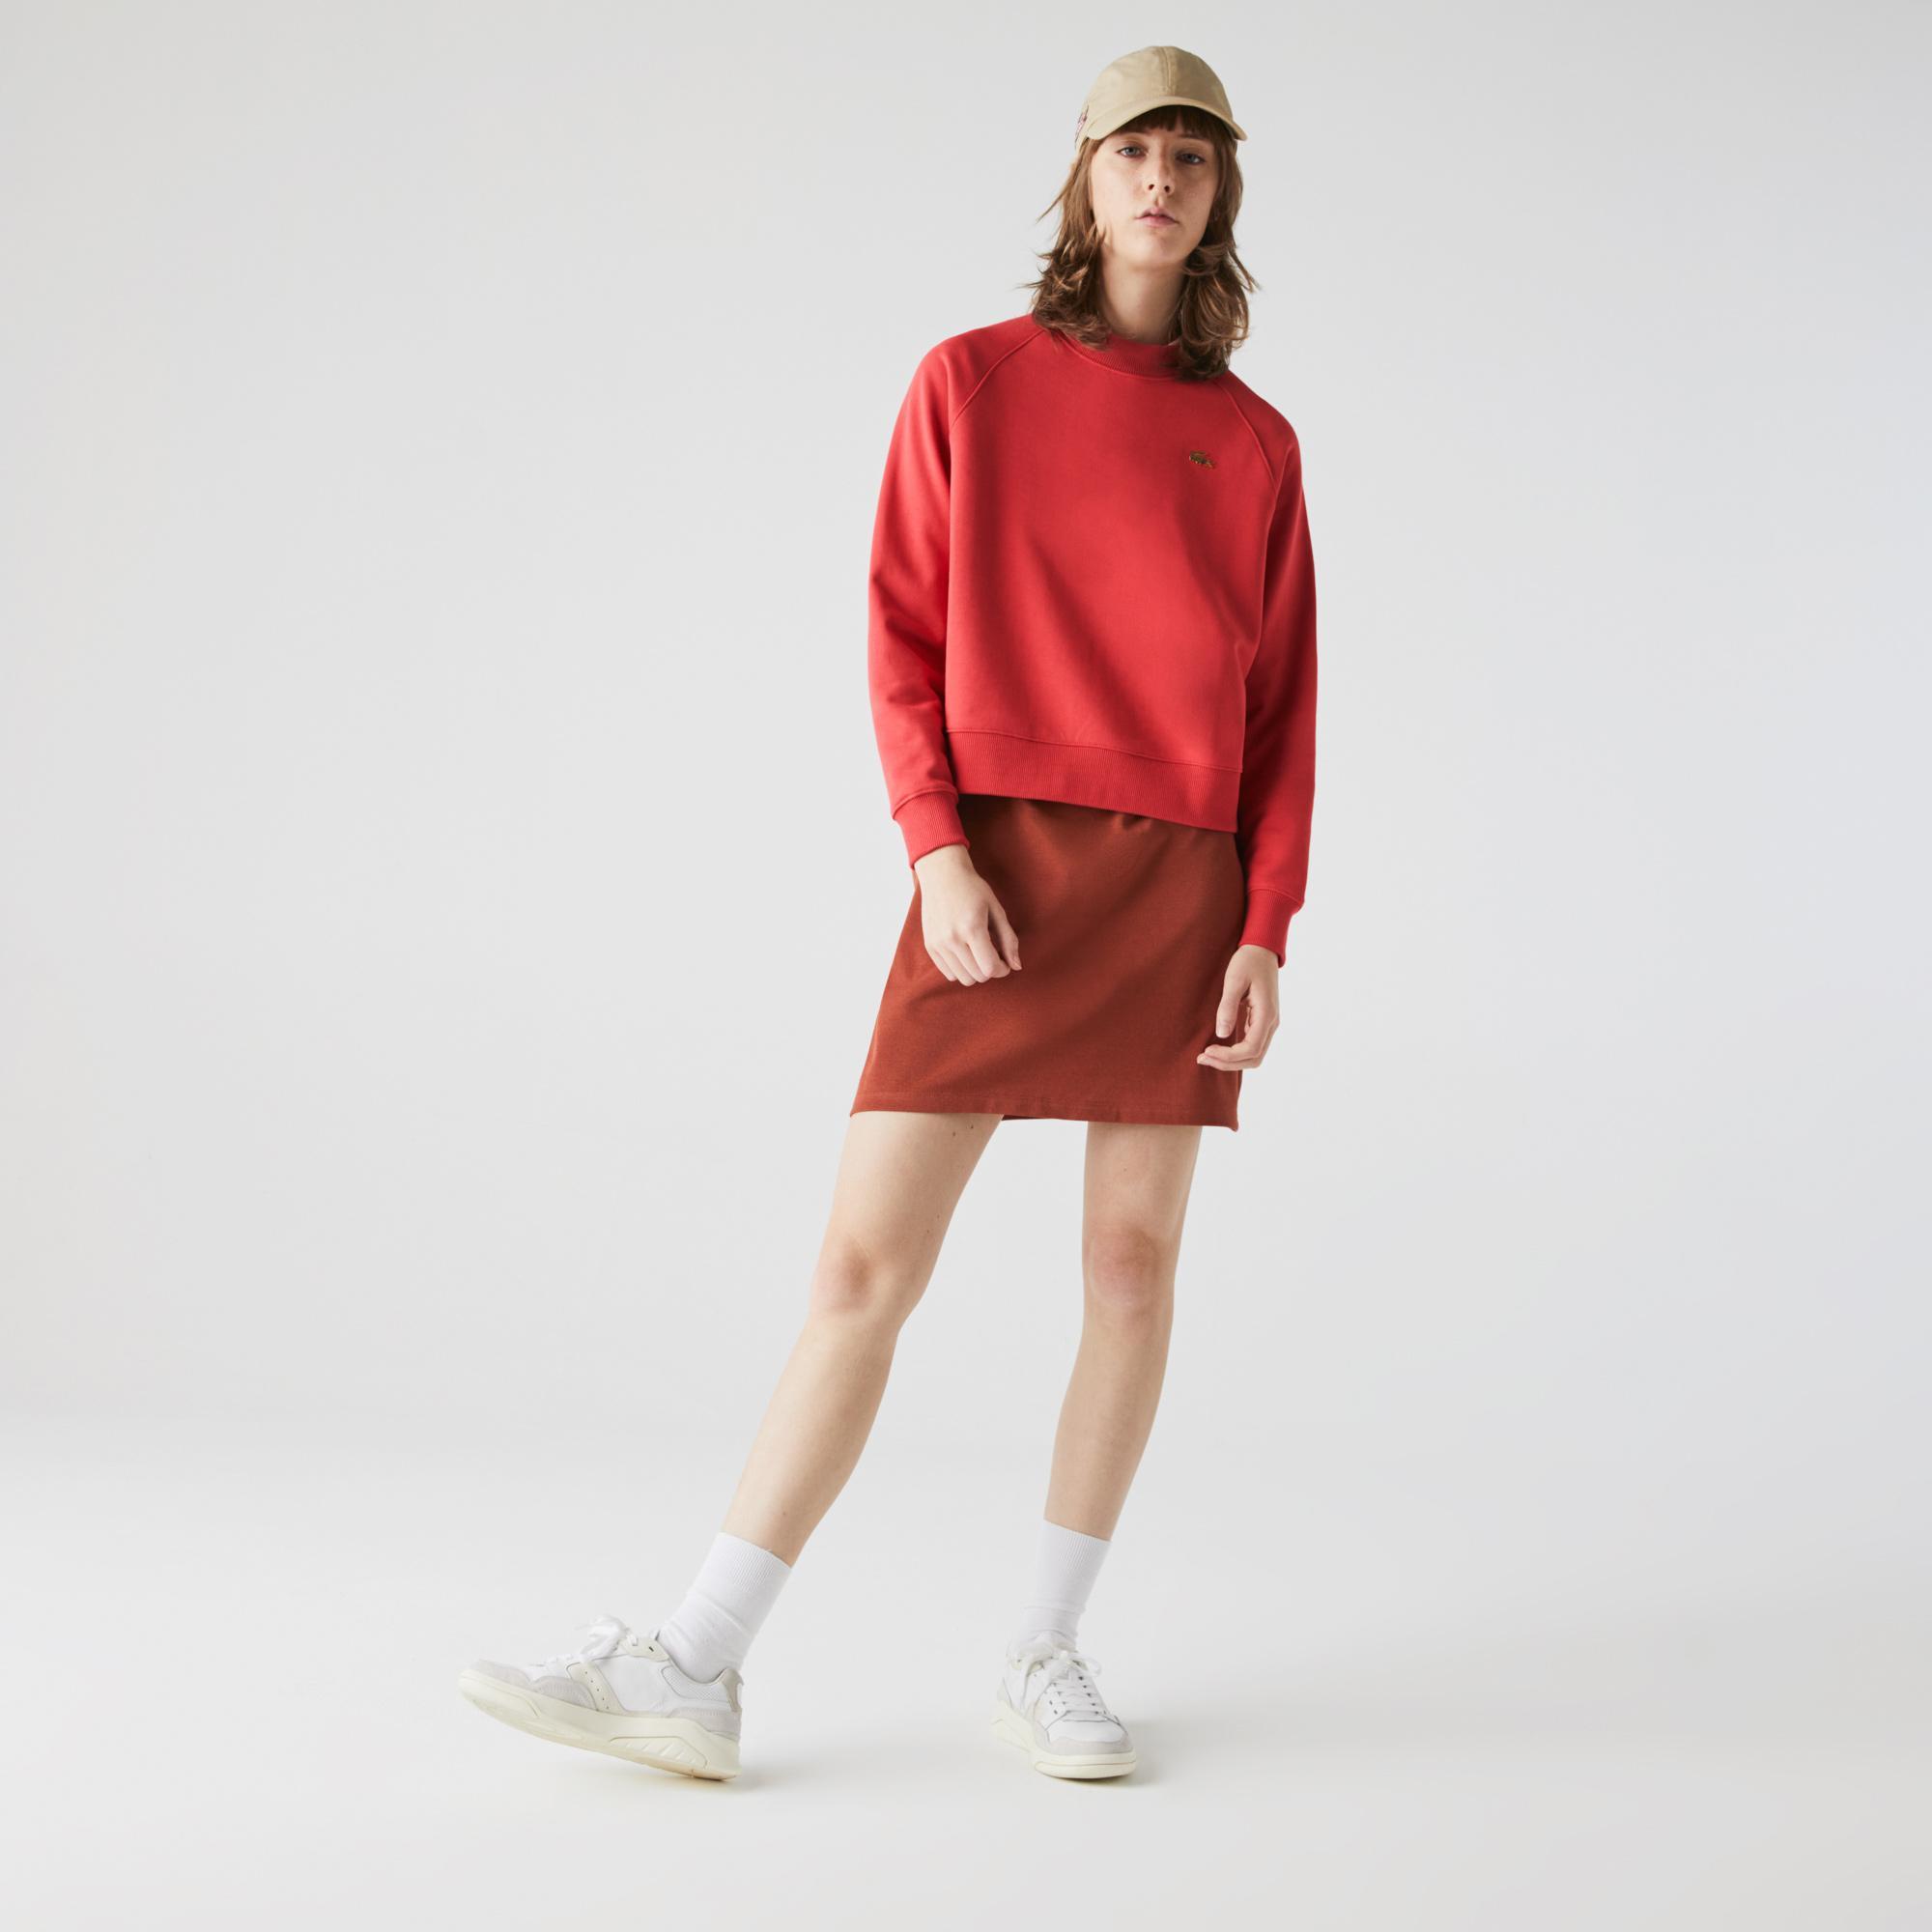 Lacoste L!ve Kadın Boxy Fit Bisiklet Yaka Kırmızı Sweatshirt